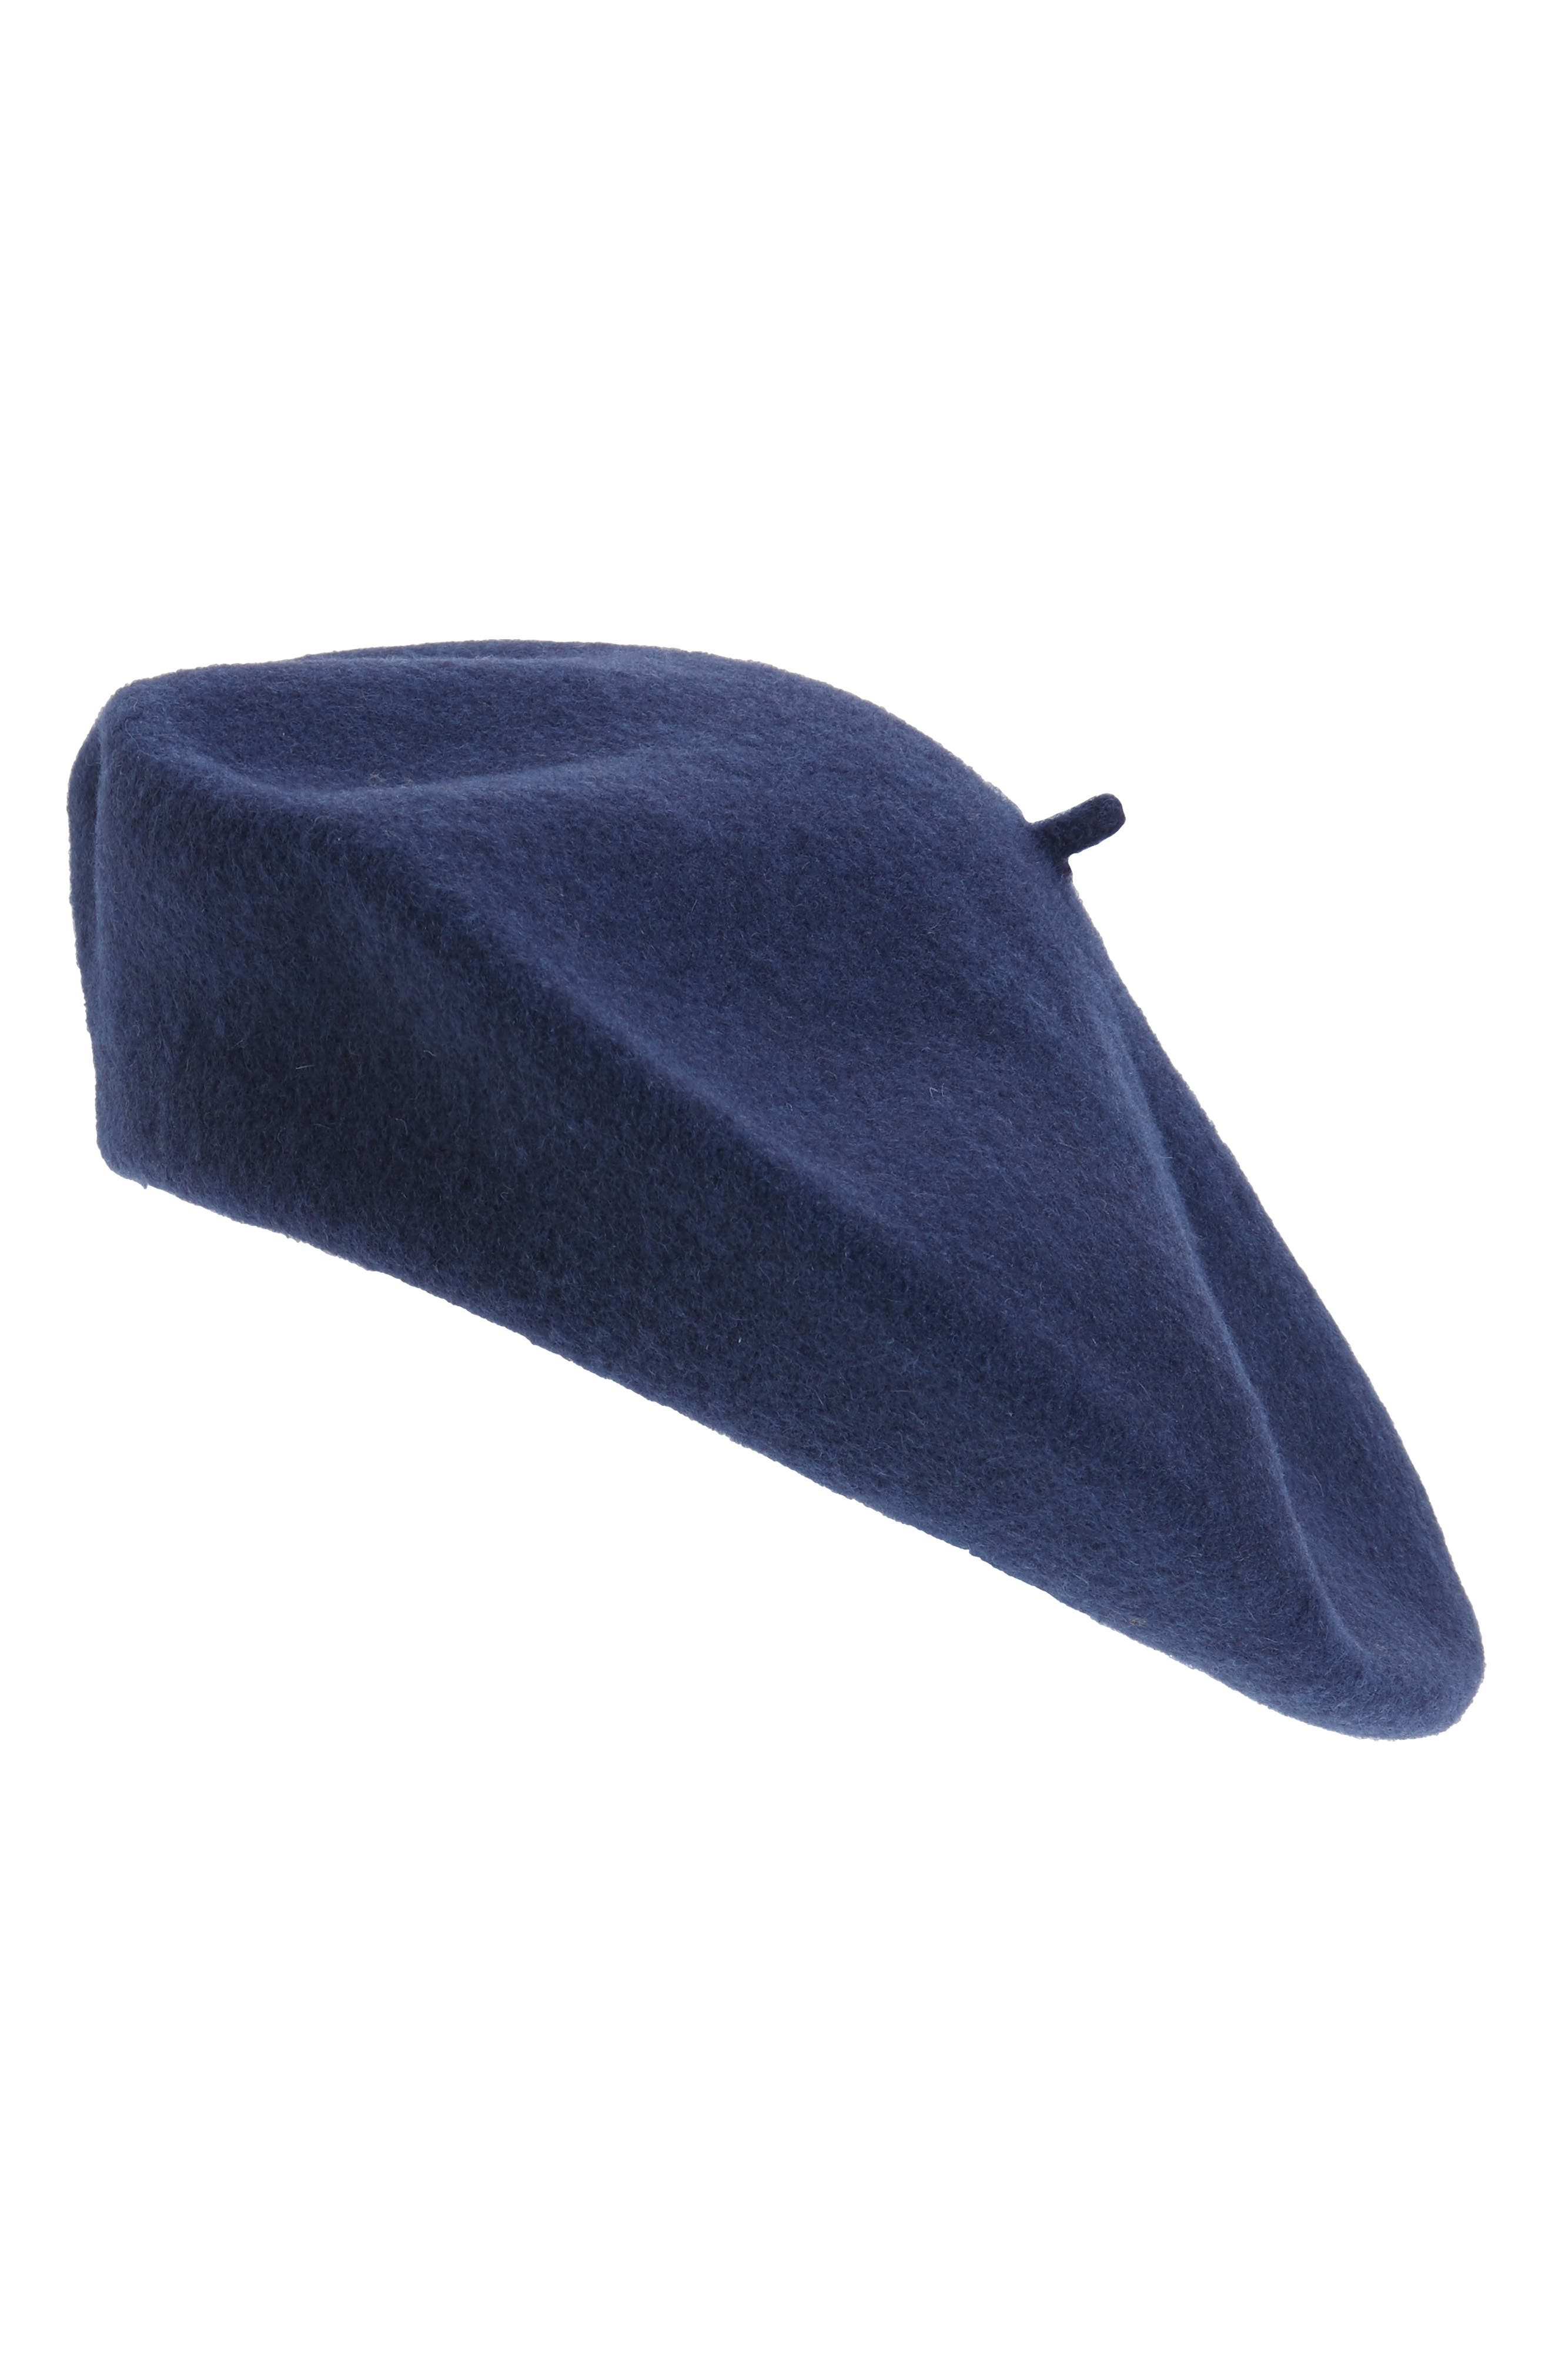 x Biltmore<sup>®</sup> Wool Beret,                             Main thumbnail 1, color,                             400